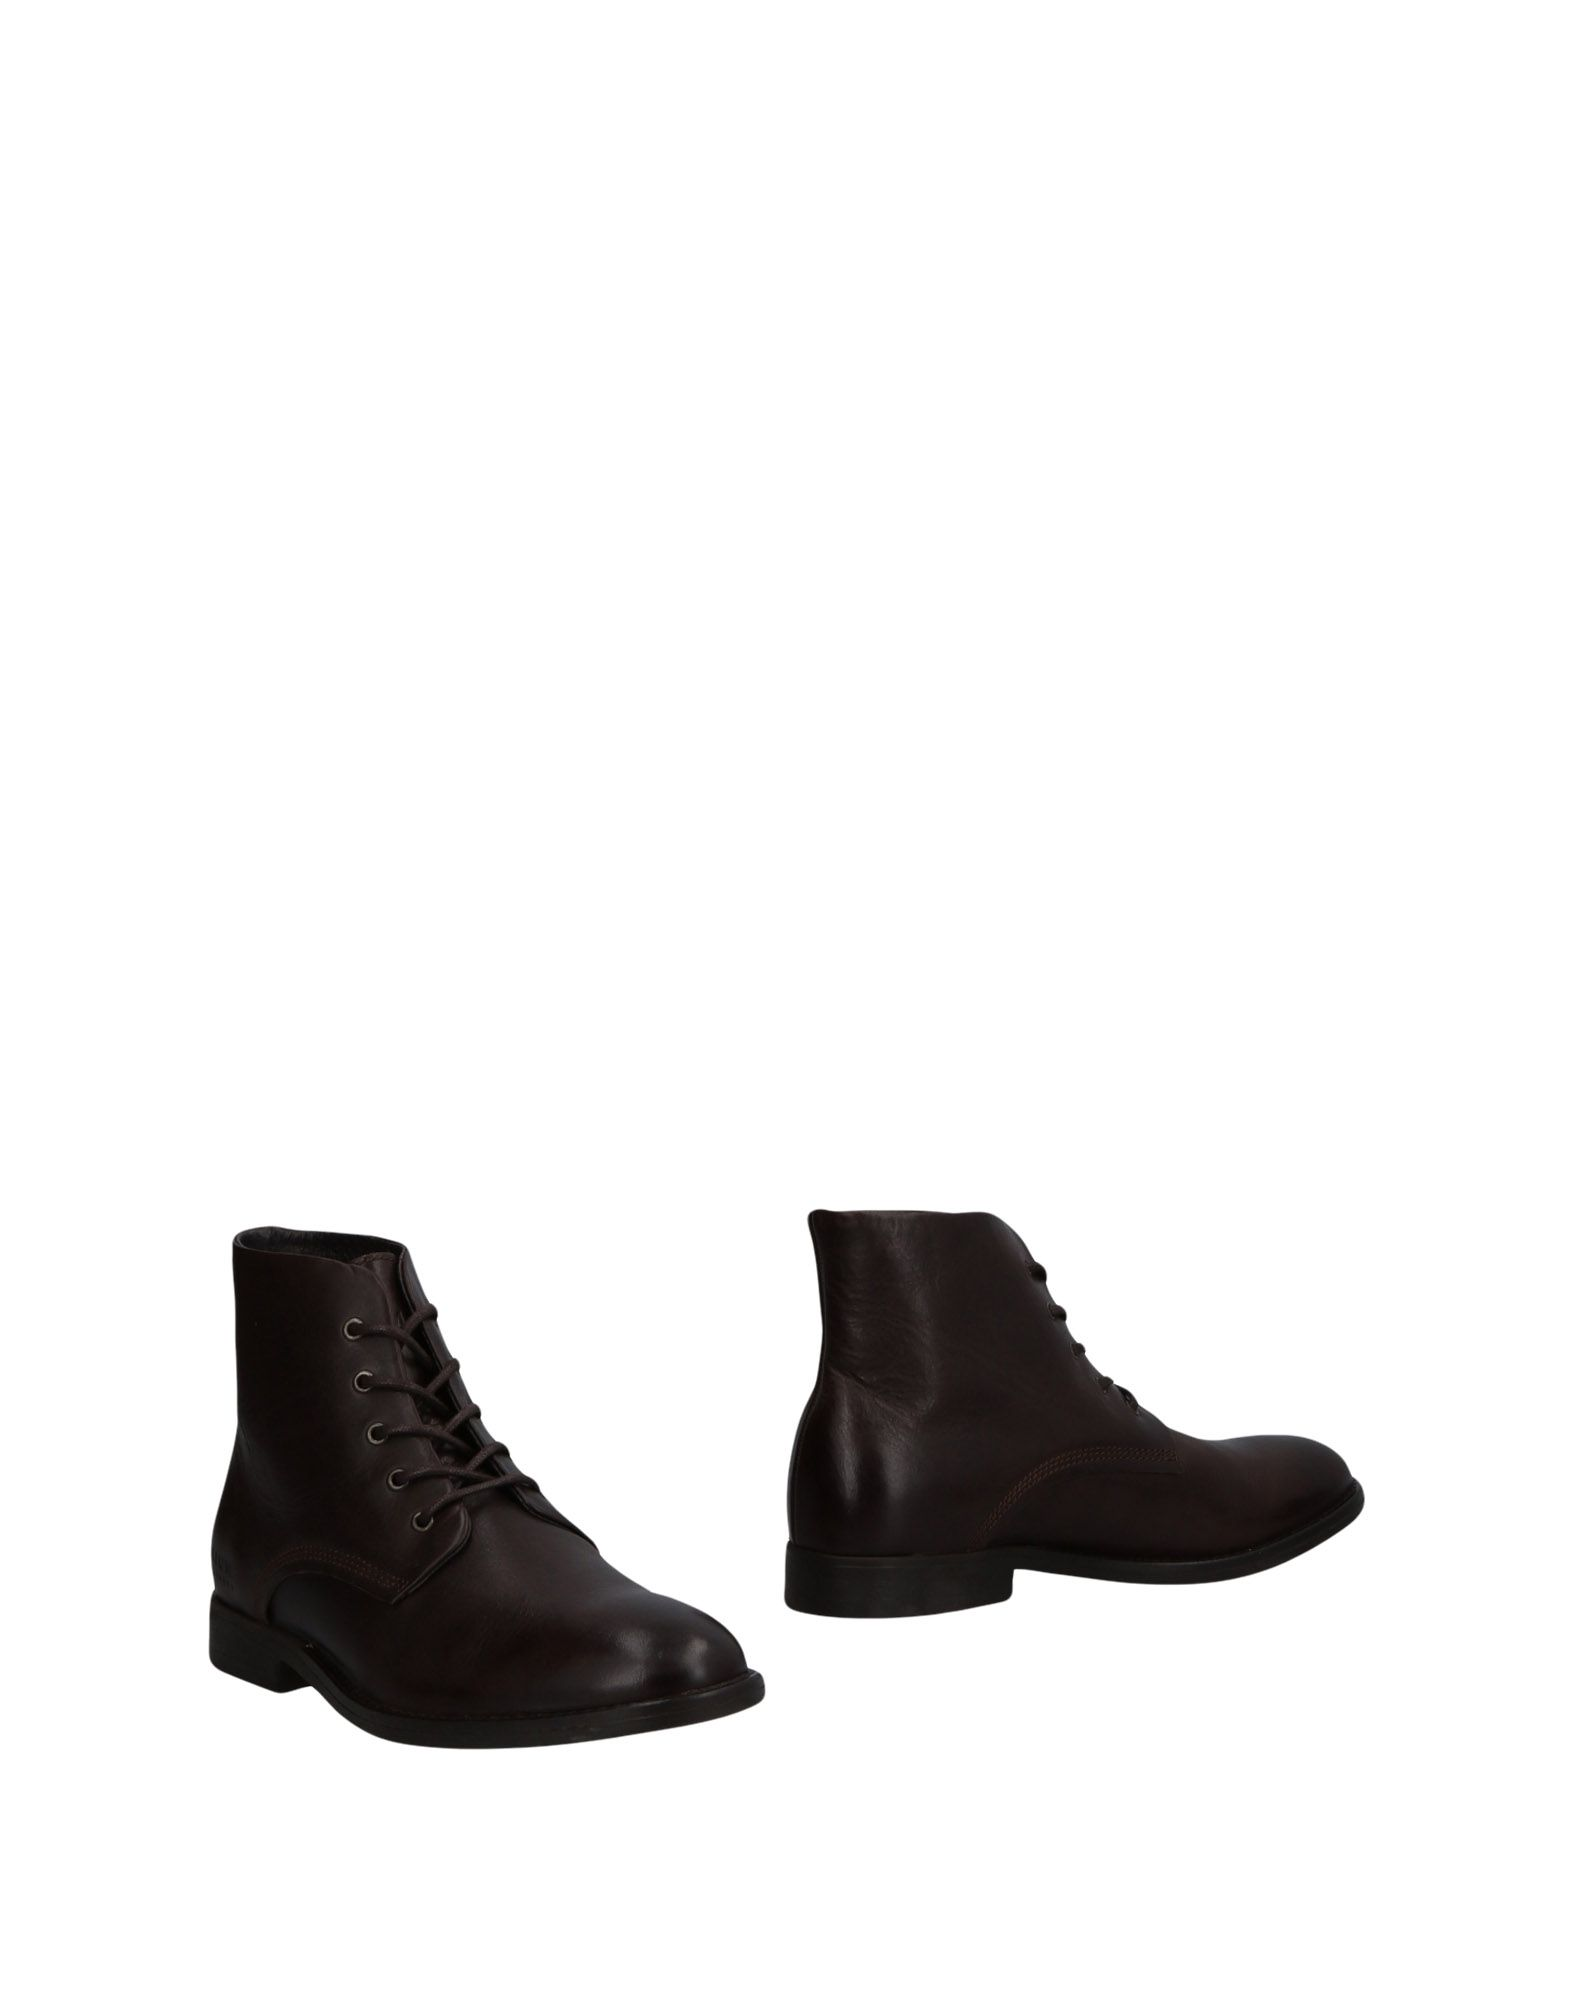 Rabatt echte Schuhe Daniele Alessandrini Premium By Jack & Jones Stiefelette Herren  11486522FG